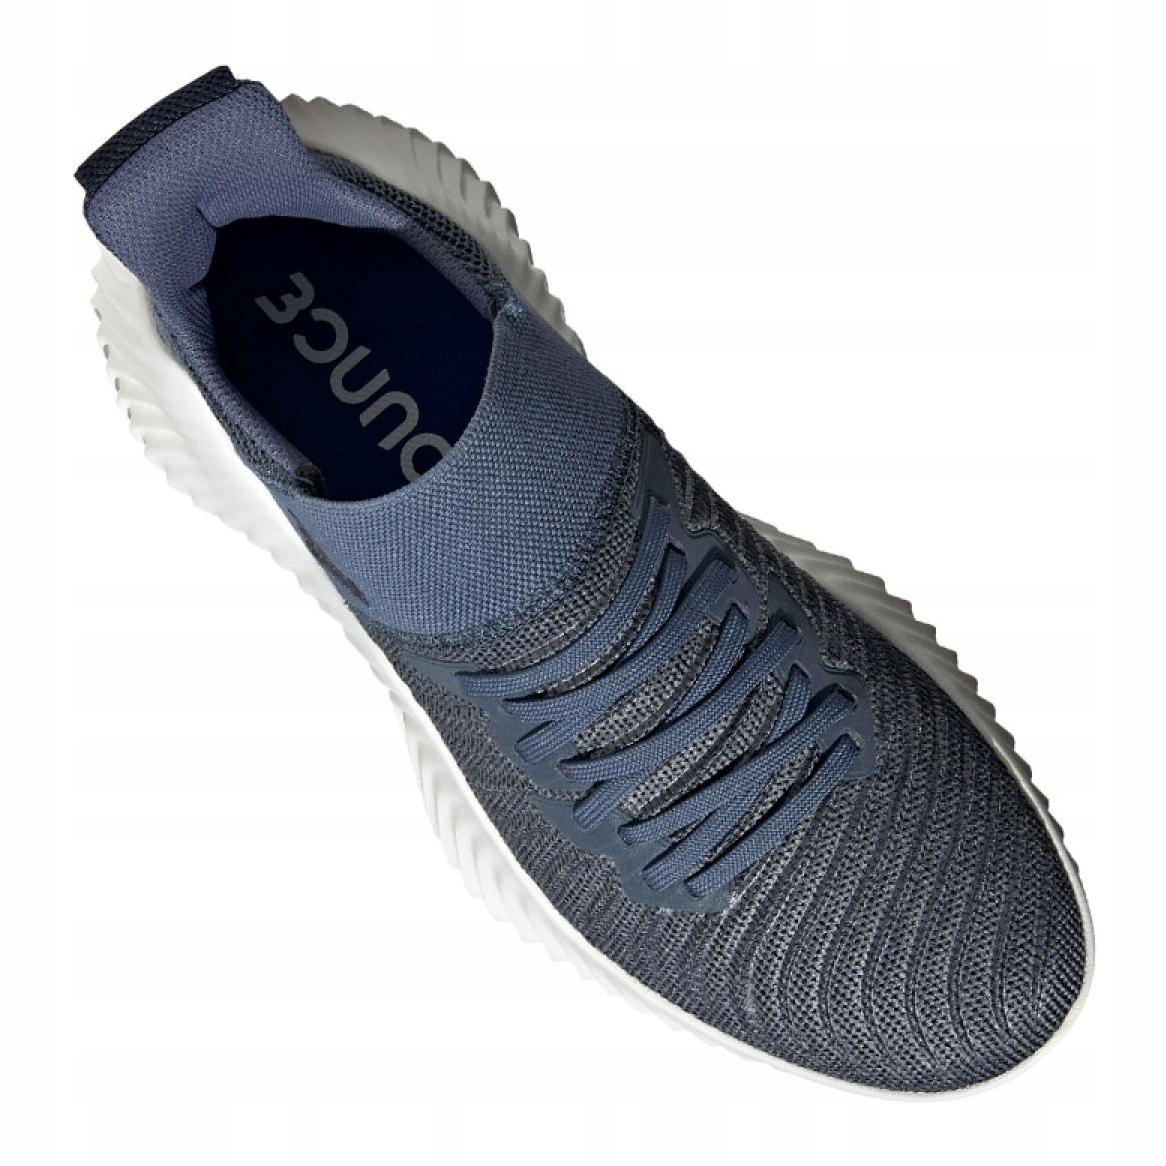 bas prix 4a98b 39cd1 Blue Running shoes adidas Alphabounce Trainer M CG6237